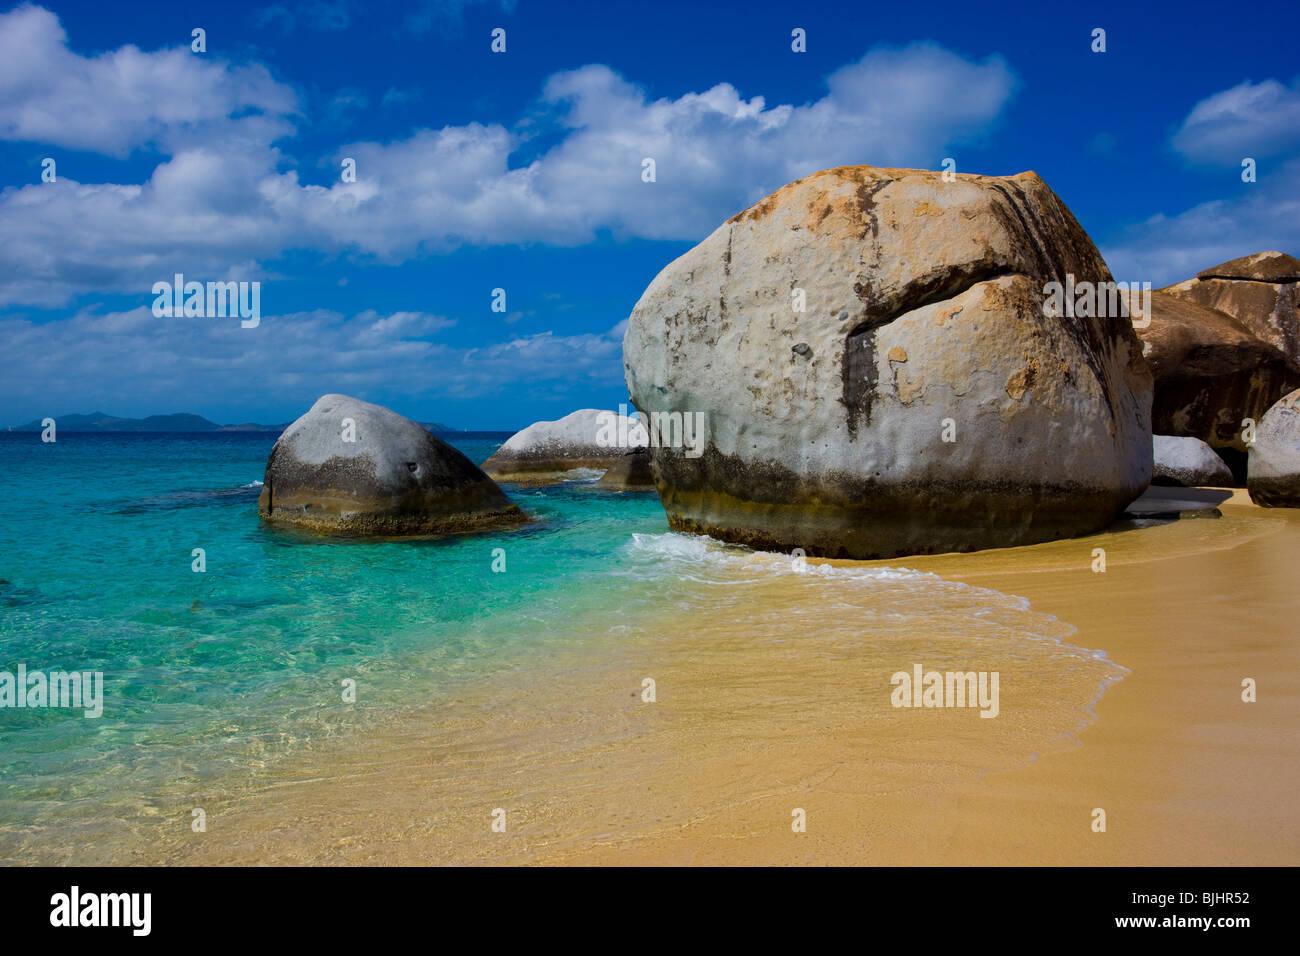 Small beach between boulders, The Baths, Virgin Gorda, British Virgin Islands, The Baths National Park, Caribbean - Stock Image